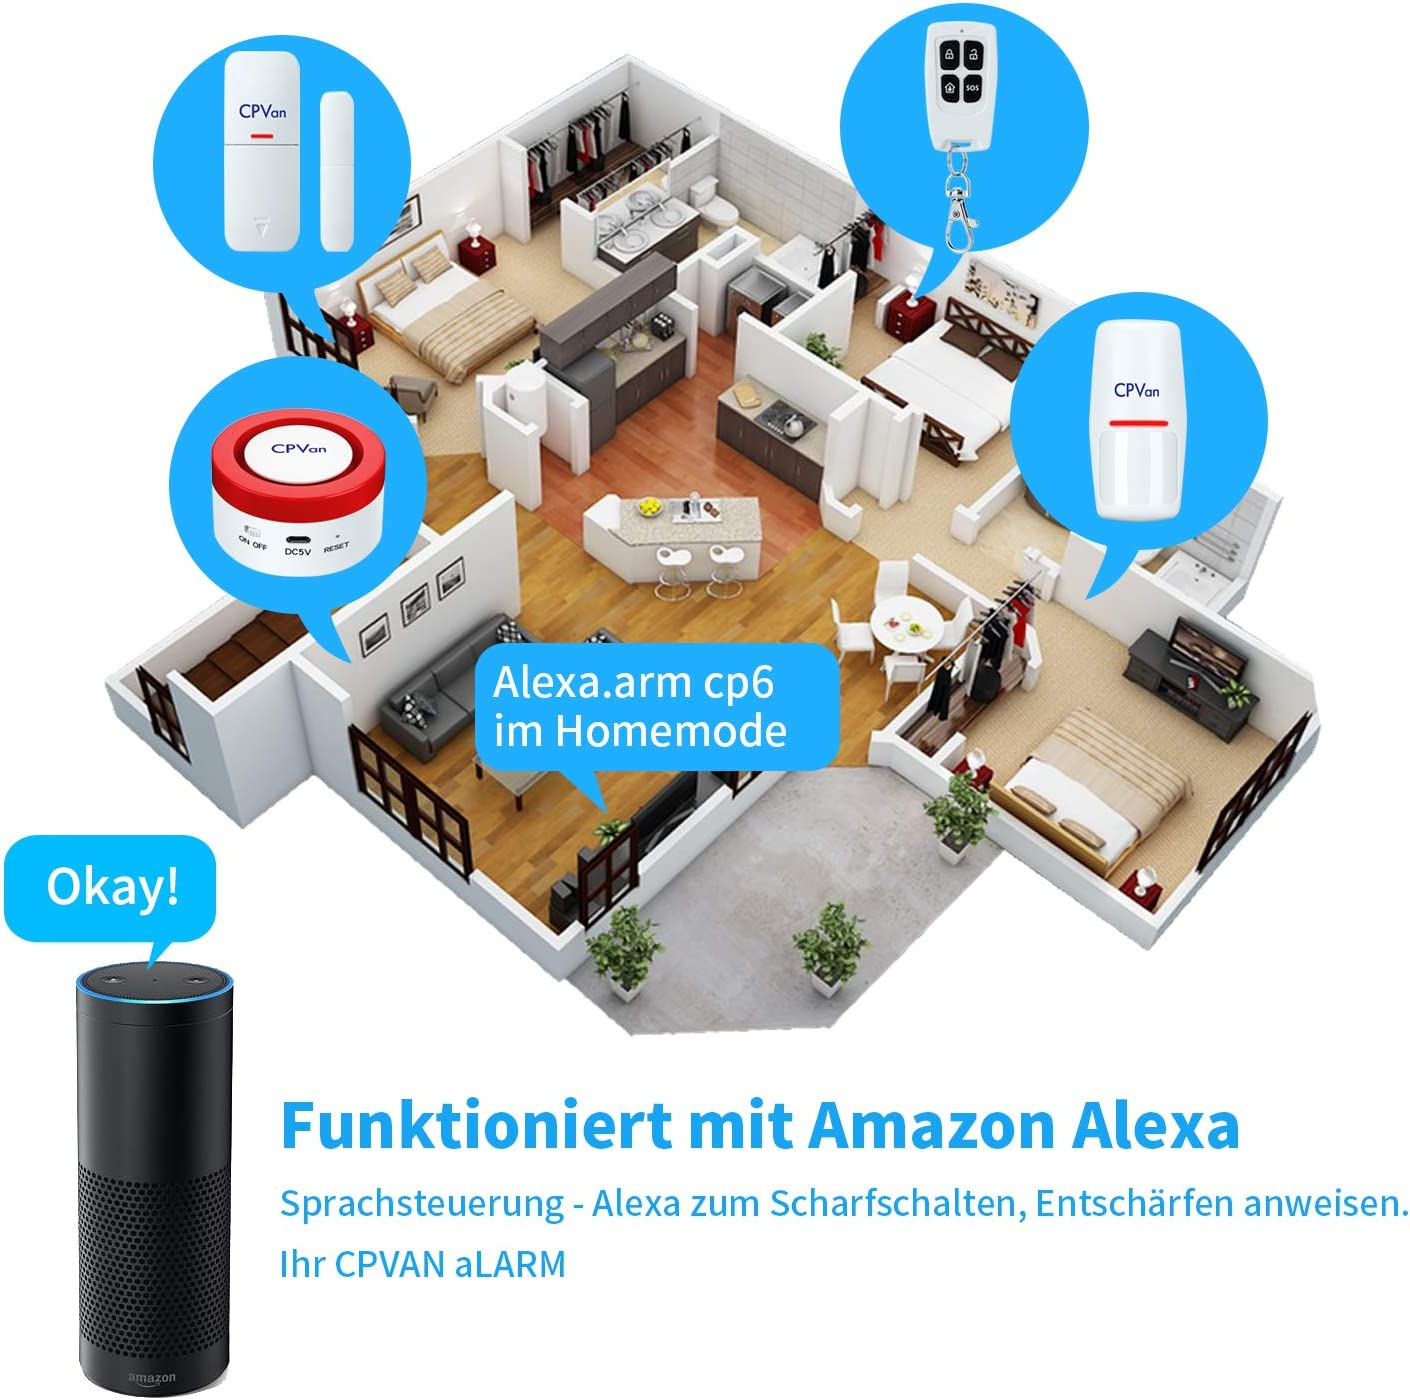 sistema di allarme intelligente Work with Aleax sistema di allarme di sicurezza con sensore di movimento, CPVAN WiFi Home Alarm System bianco sistema di allarme antifurto fai da te